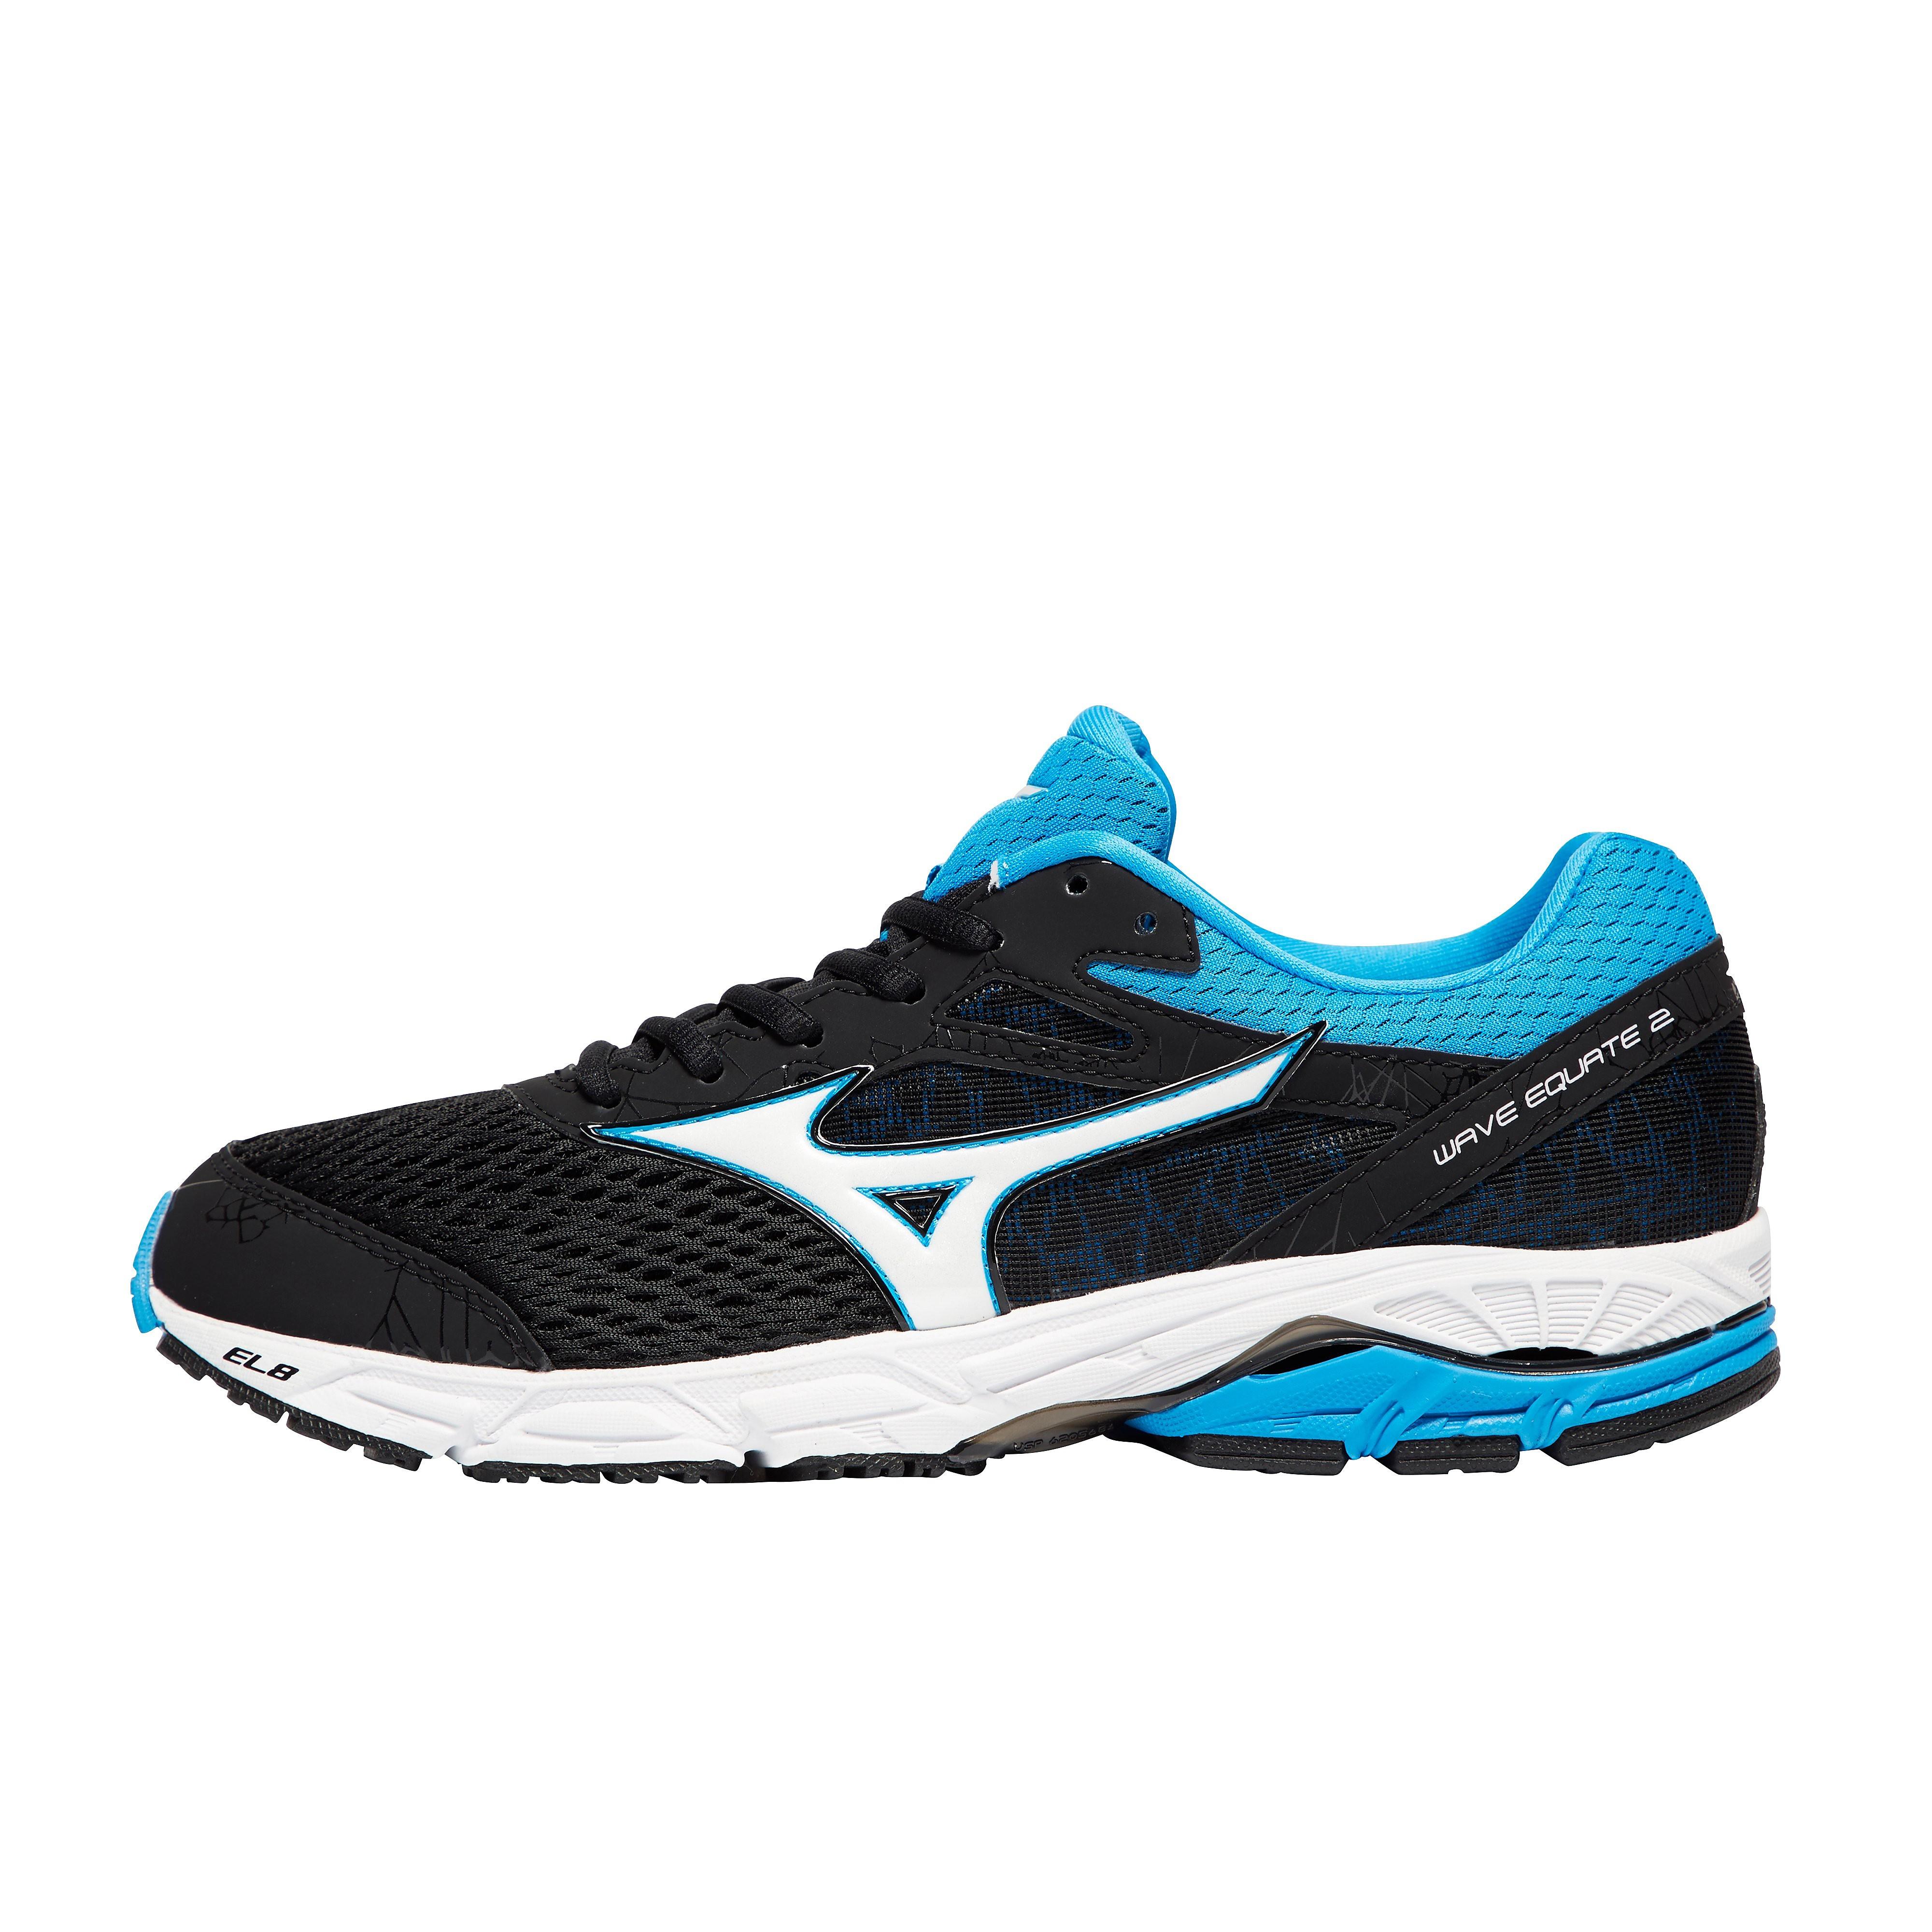 Mizuno Wave Equate 2 Men's Running Shoe